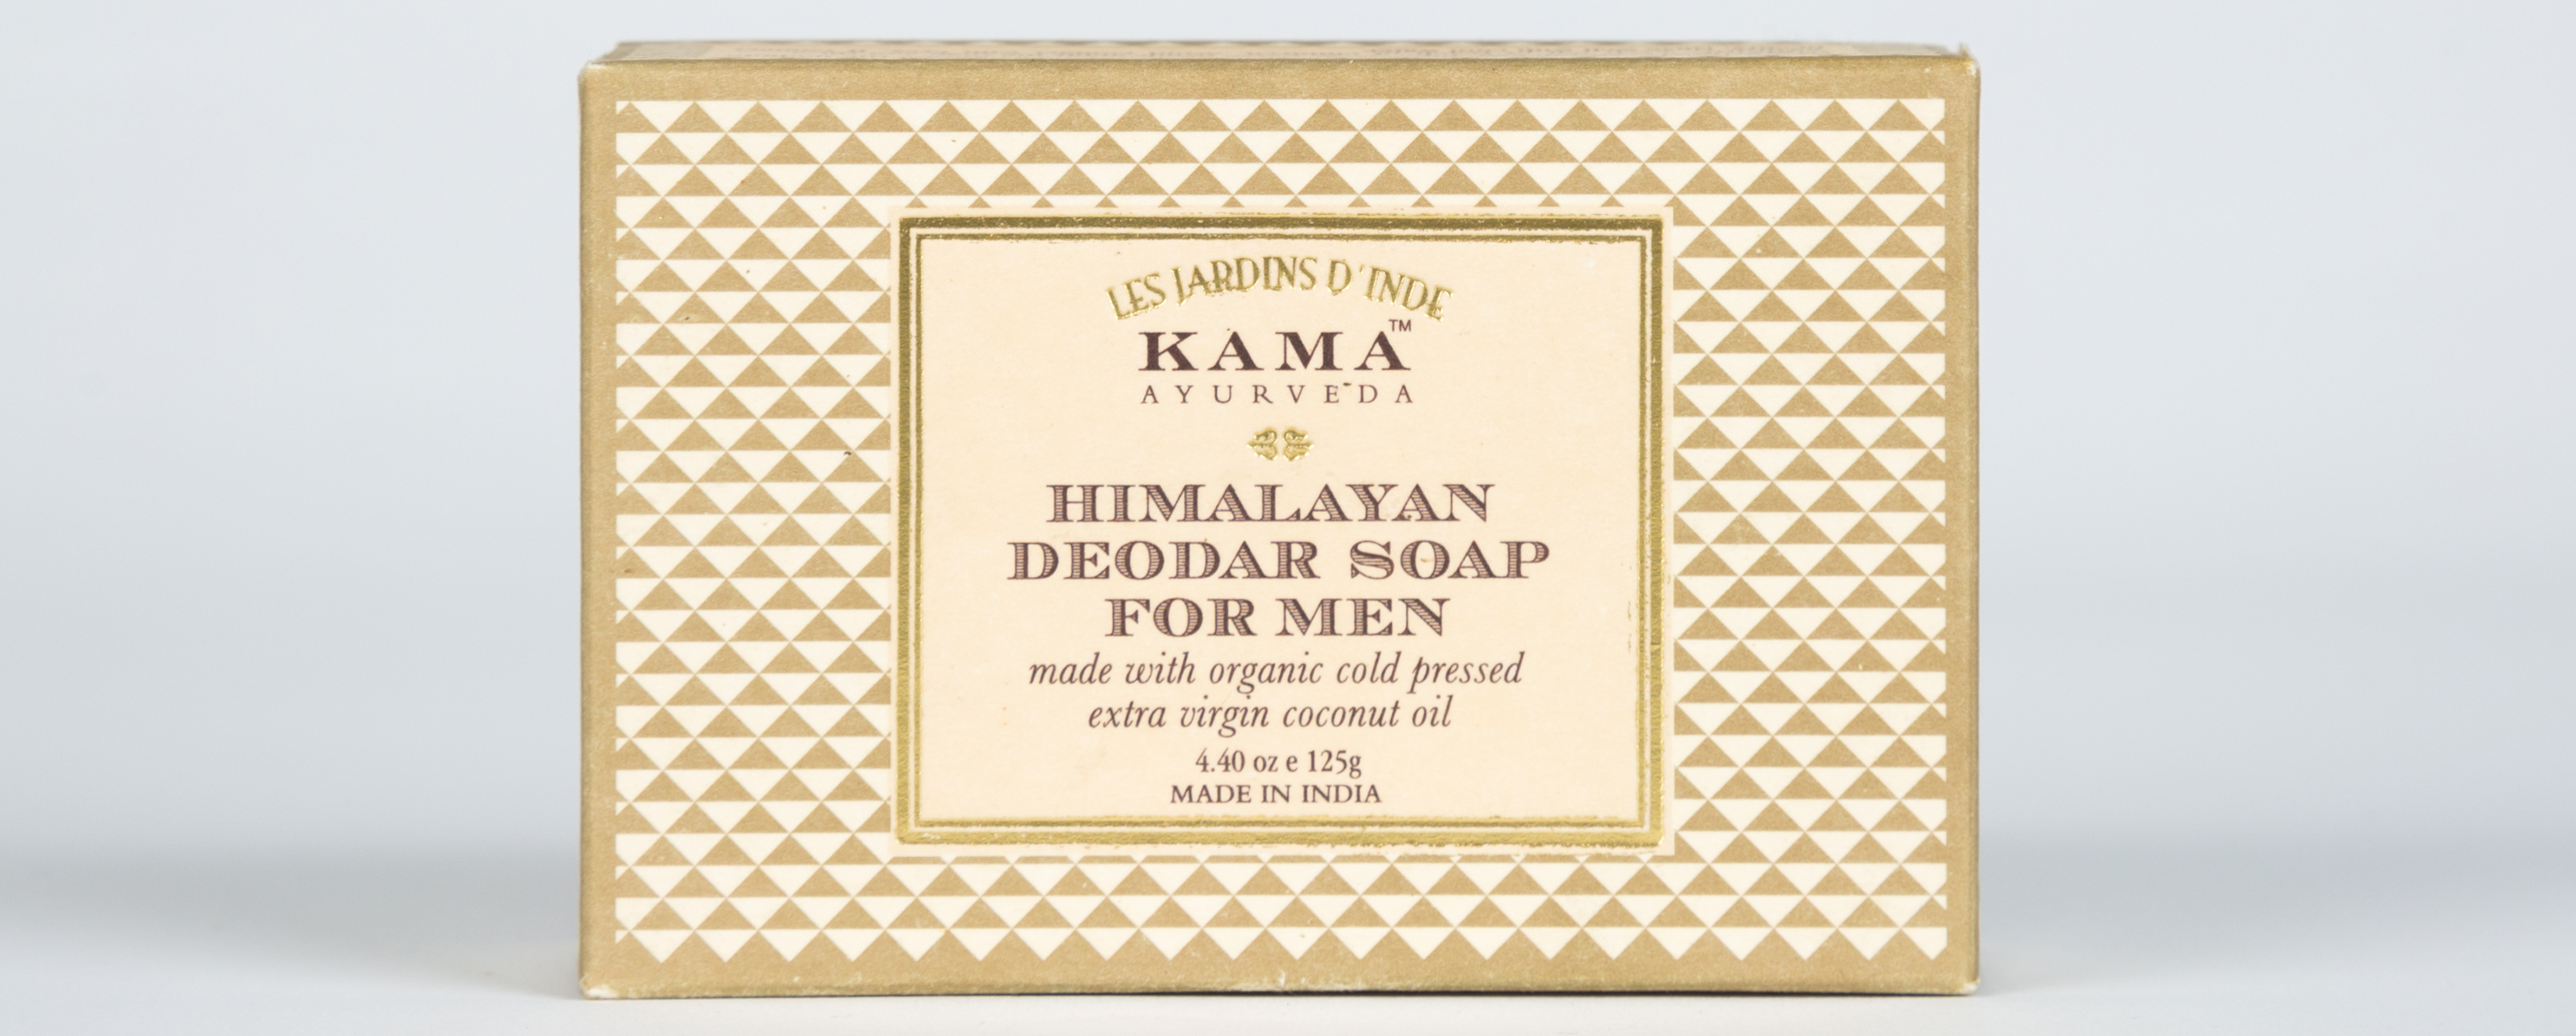 Kama Ayurveda Himalayan Deodar Soap for Men